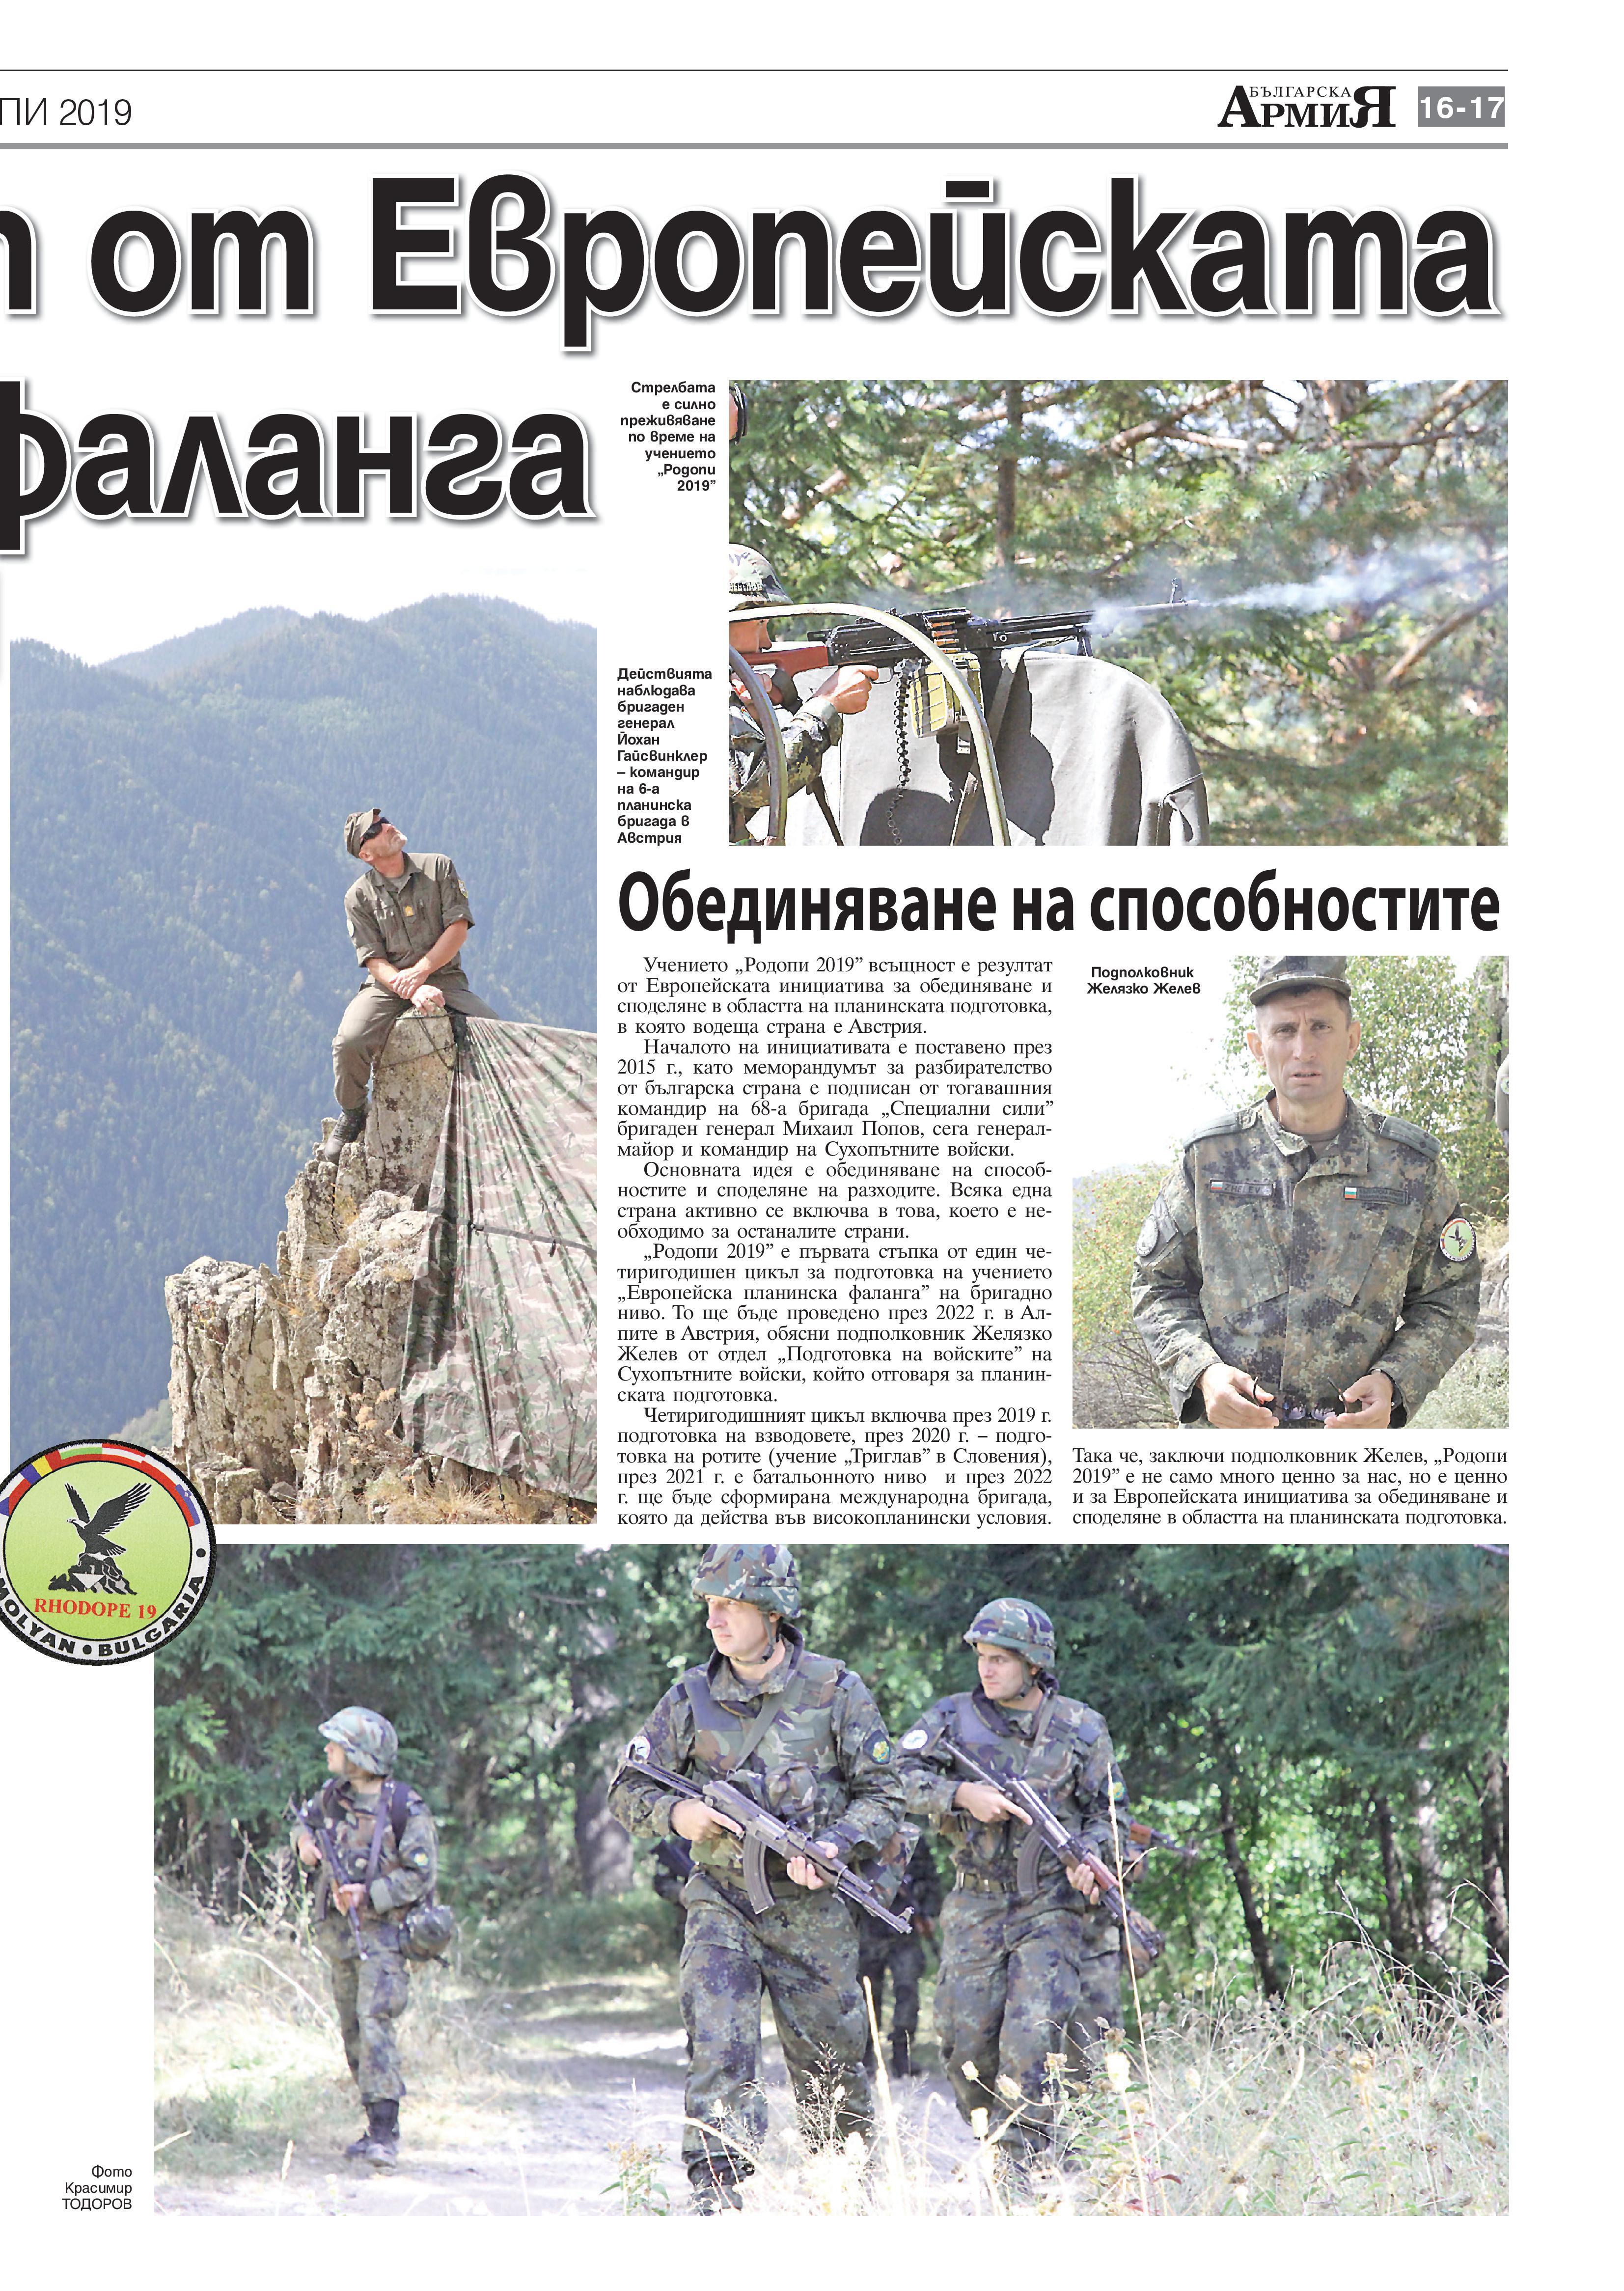 https://www.armymedia.bg/wp-content/uploads/2015/06/17-32.jpg